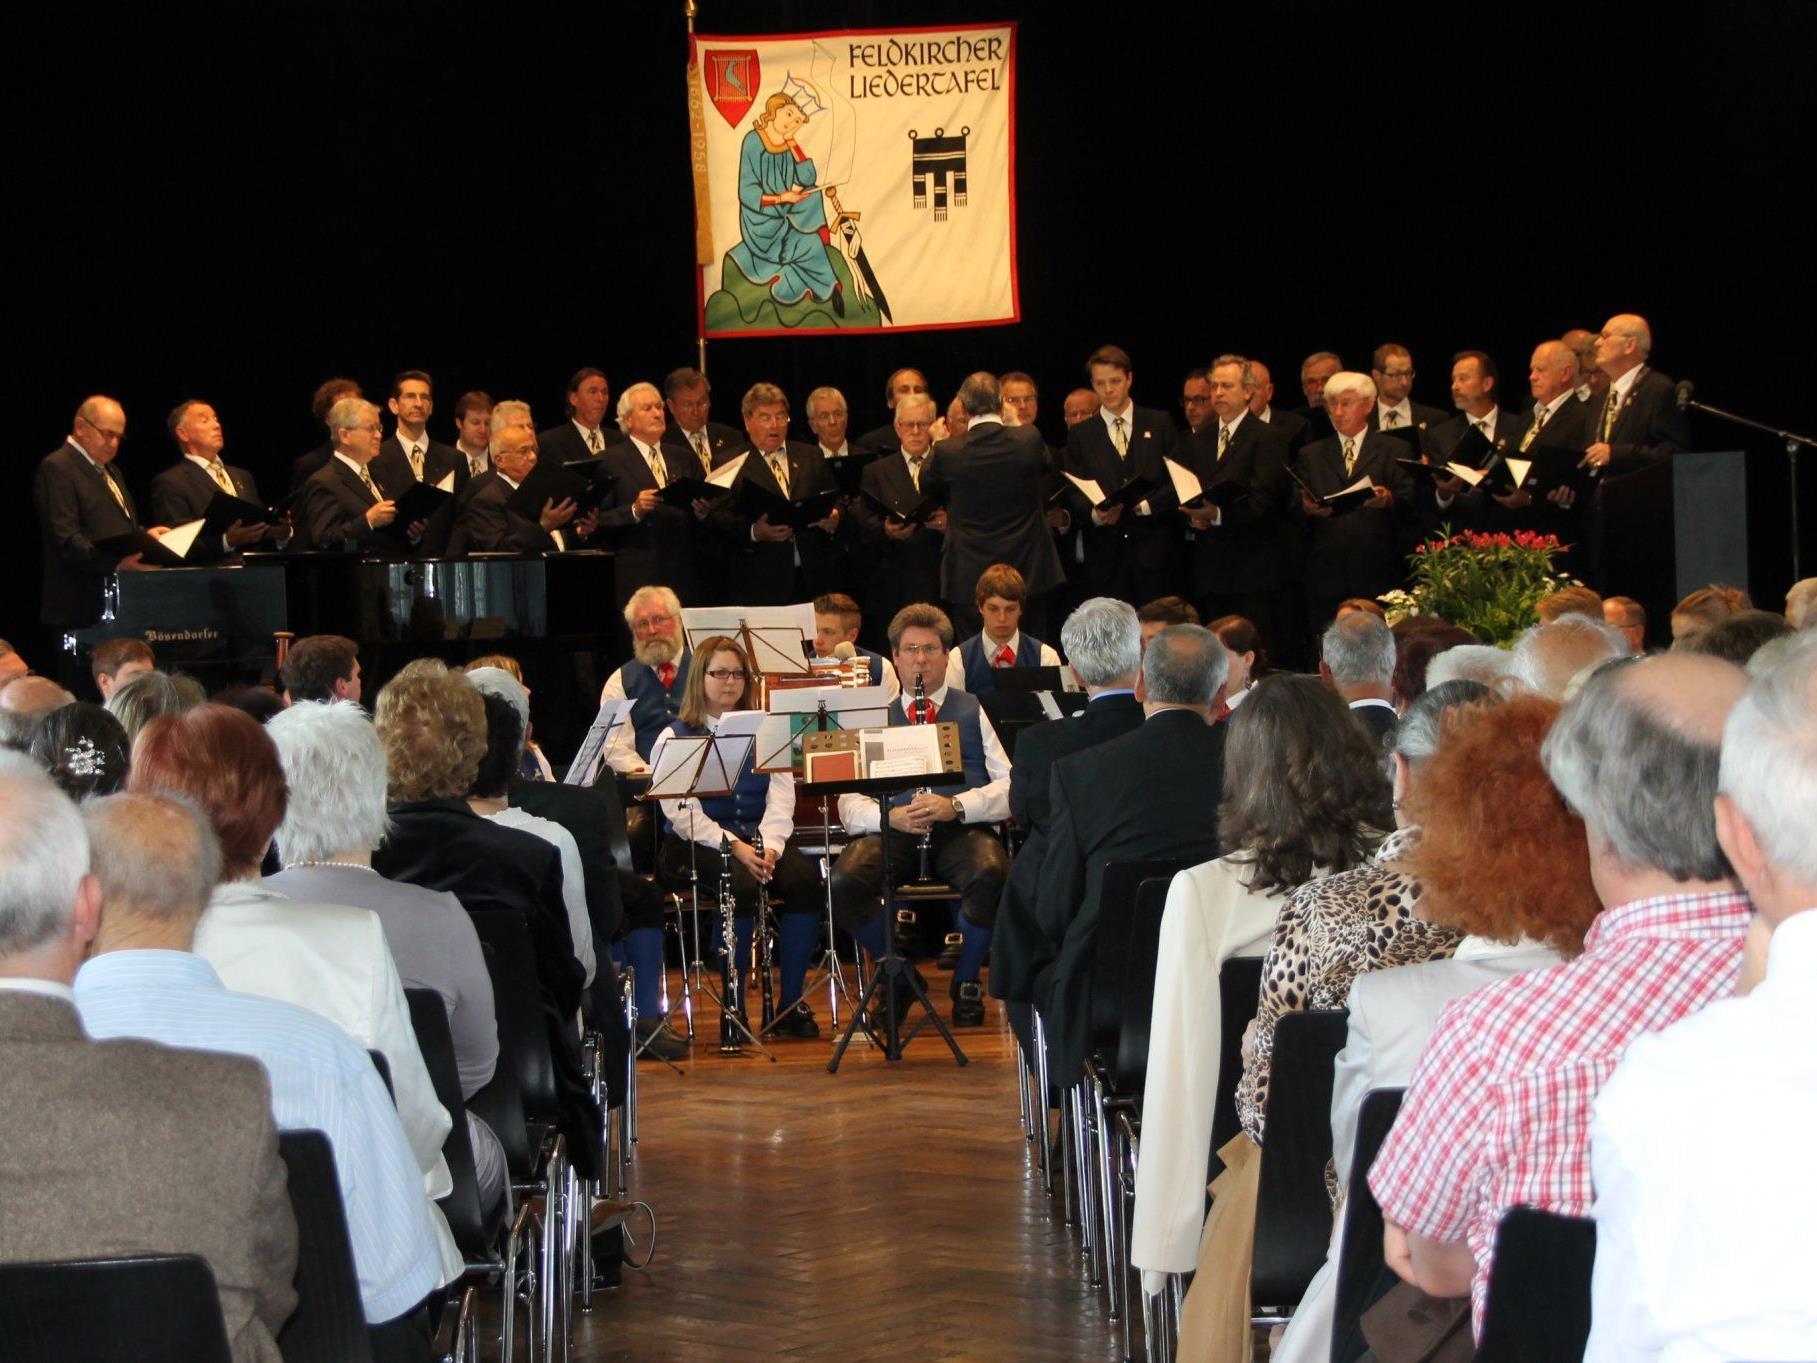 Voll besetzter Pförtnersaal beim 150-jährigen Liedertafel-Jubiläum.